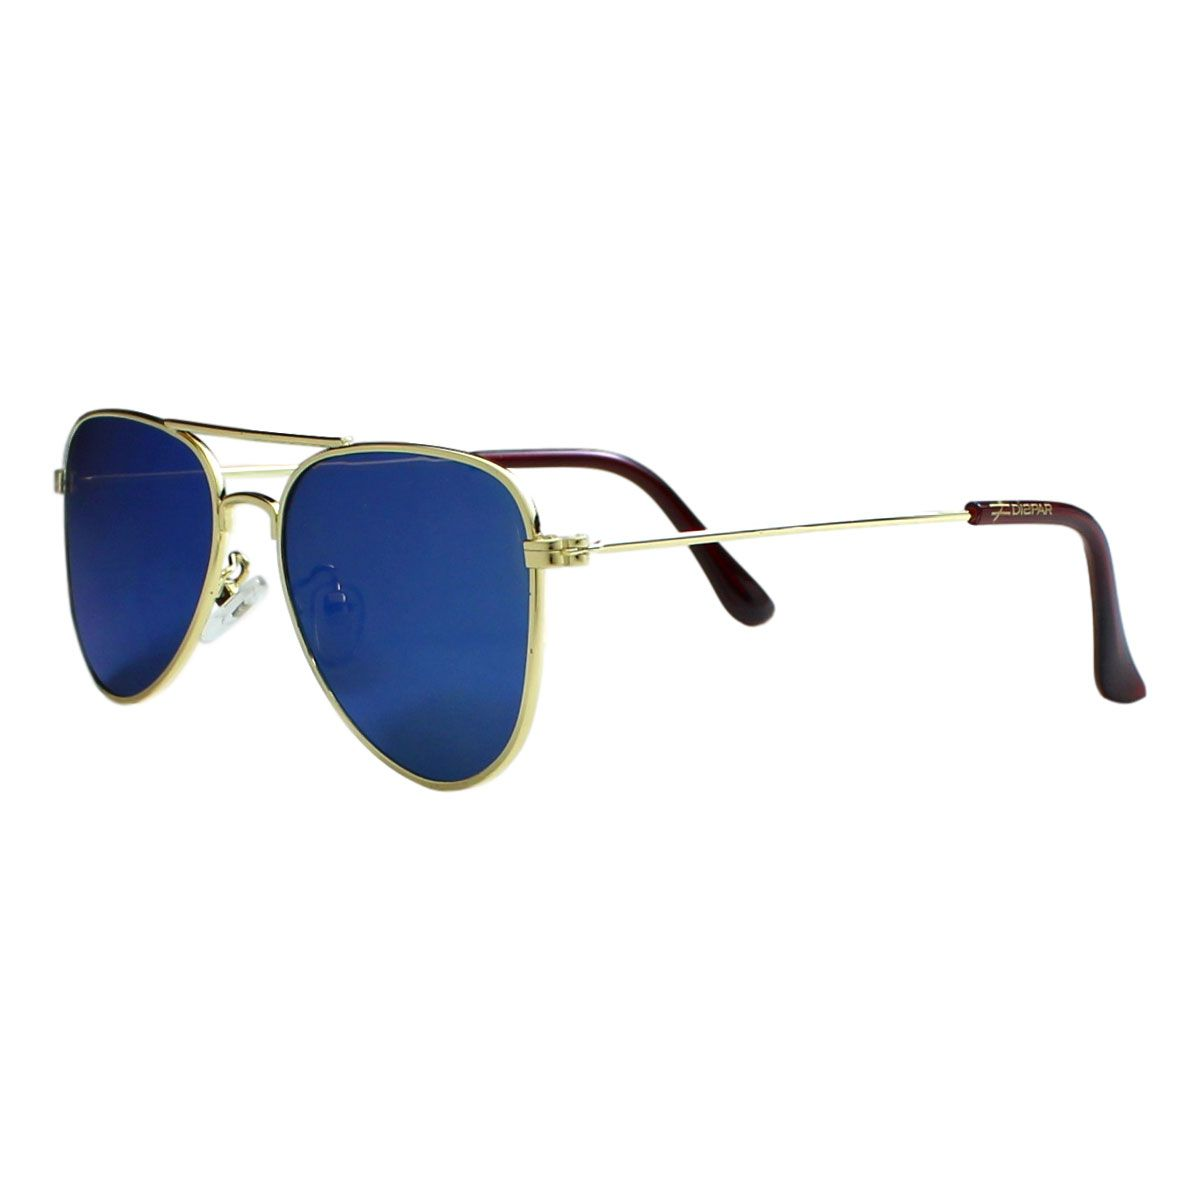 Óculos de Sol Díspar ID1904 infantil - Azul